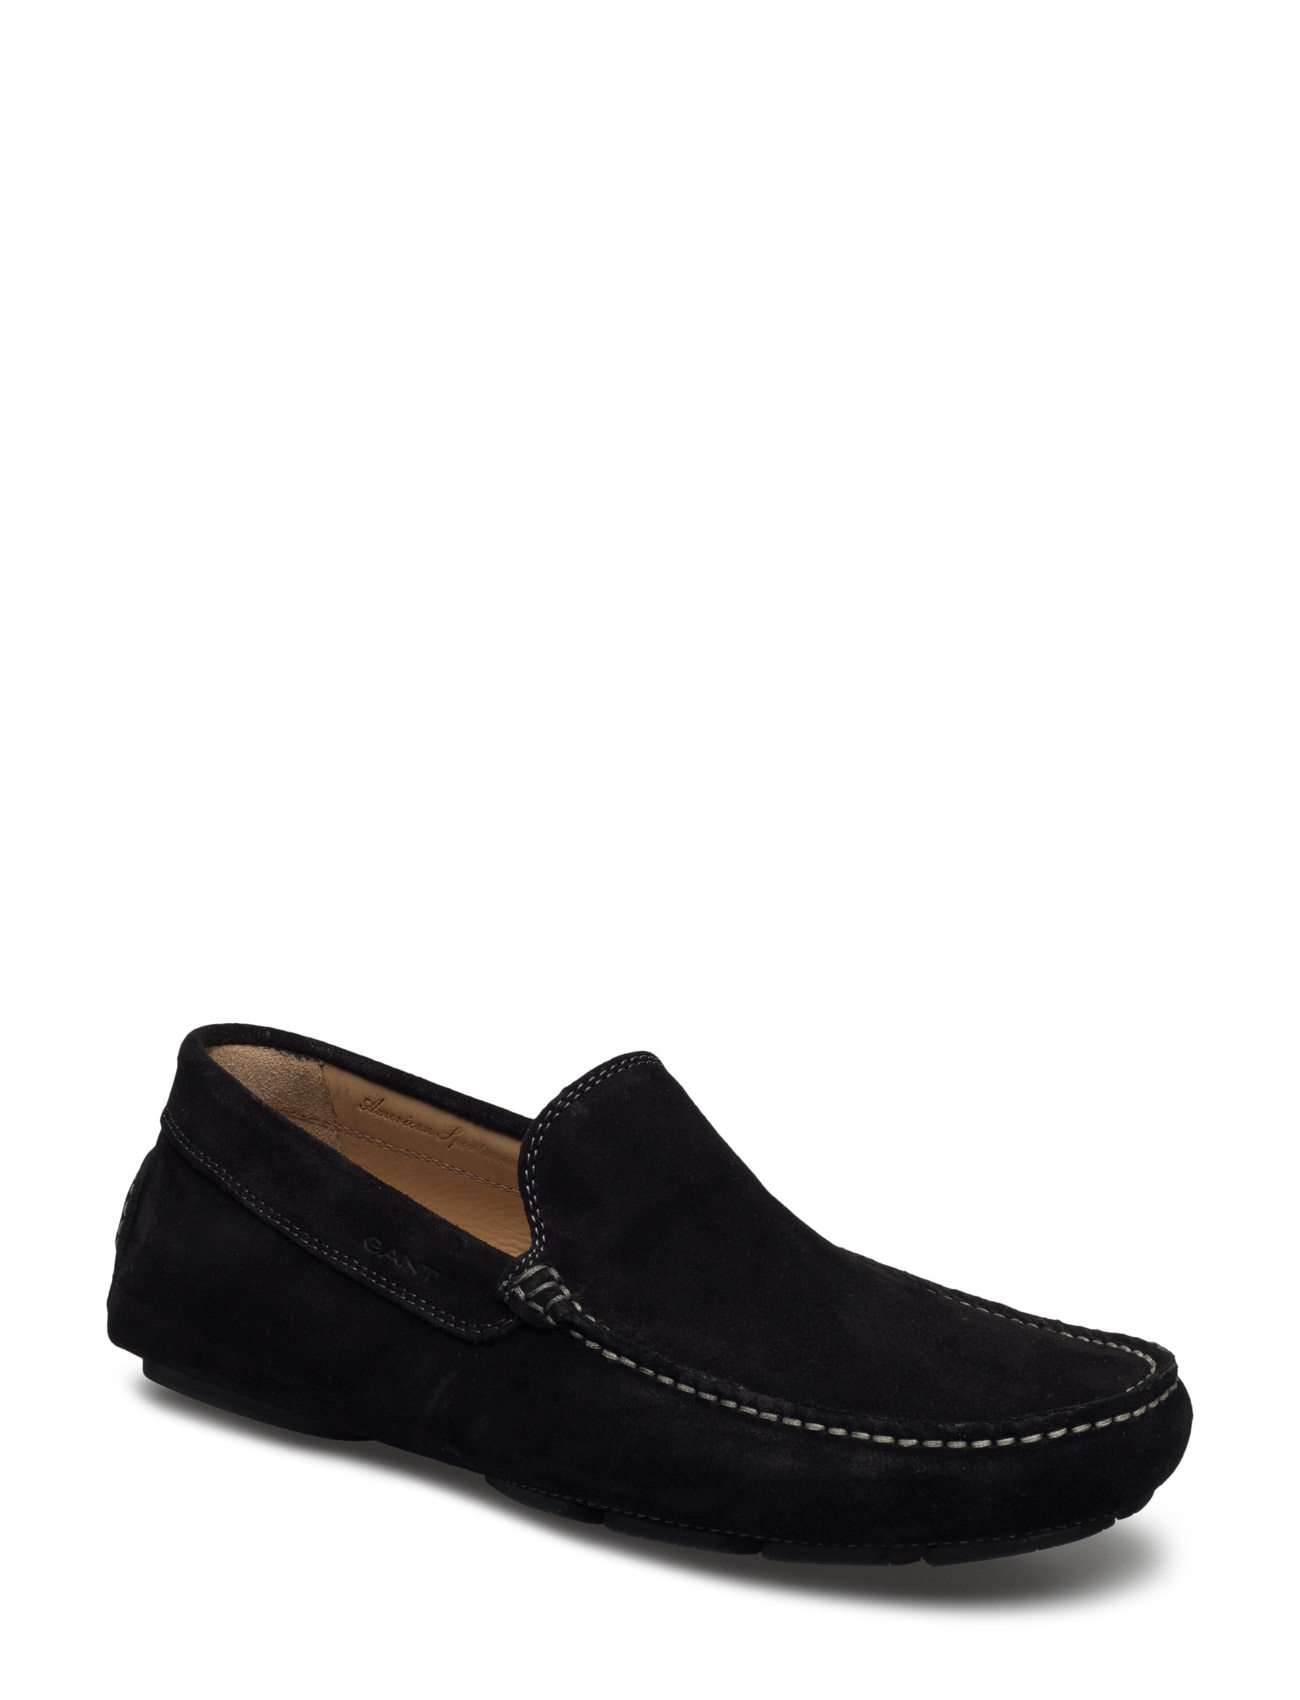 Austin Moccasin GANT Casual sko til Herrer i Sort